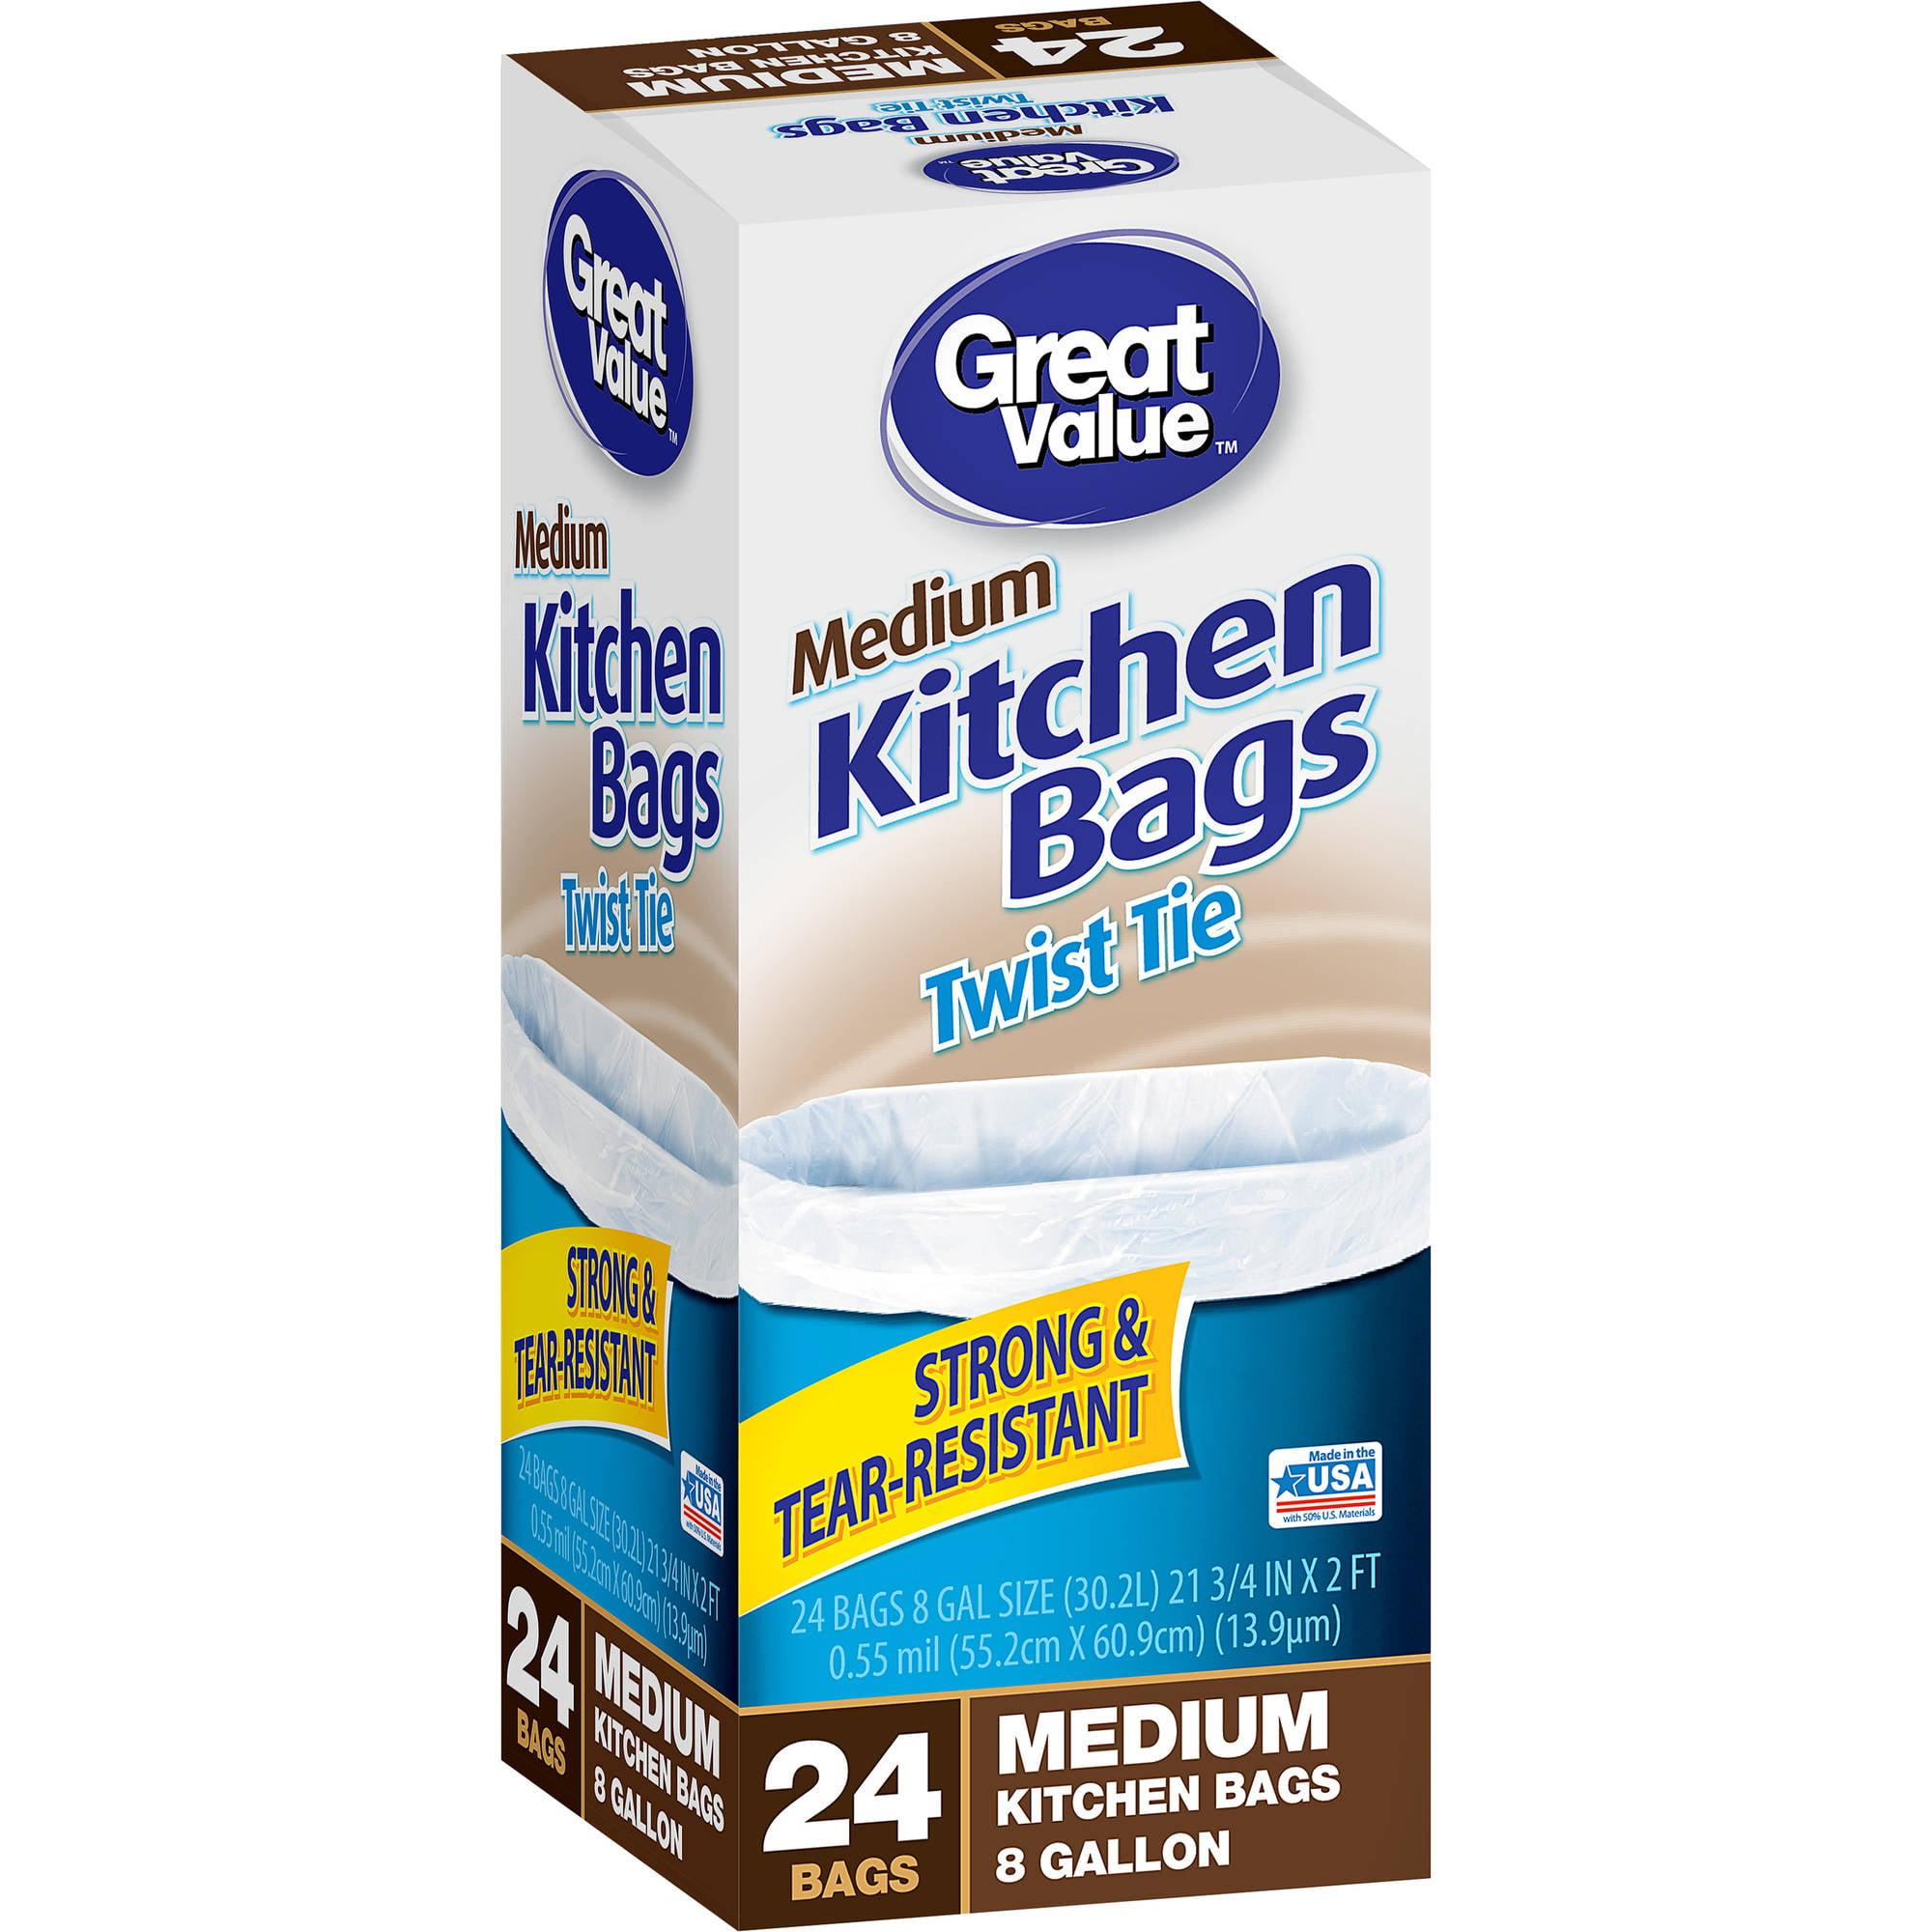 Great Value Twist Tie Medium Kitchen Bags, 8 gal, 24 count